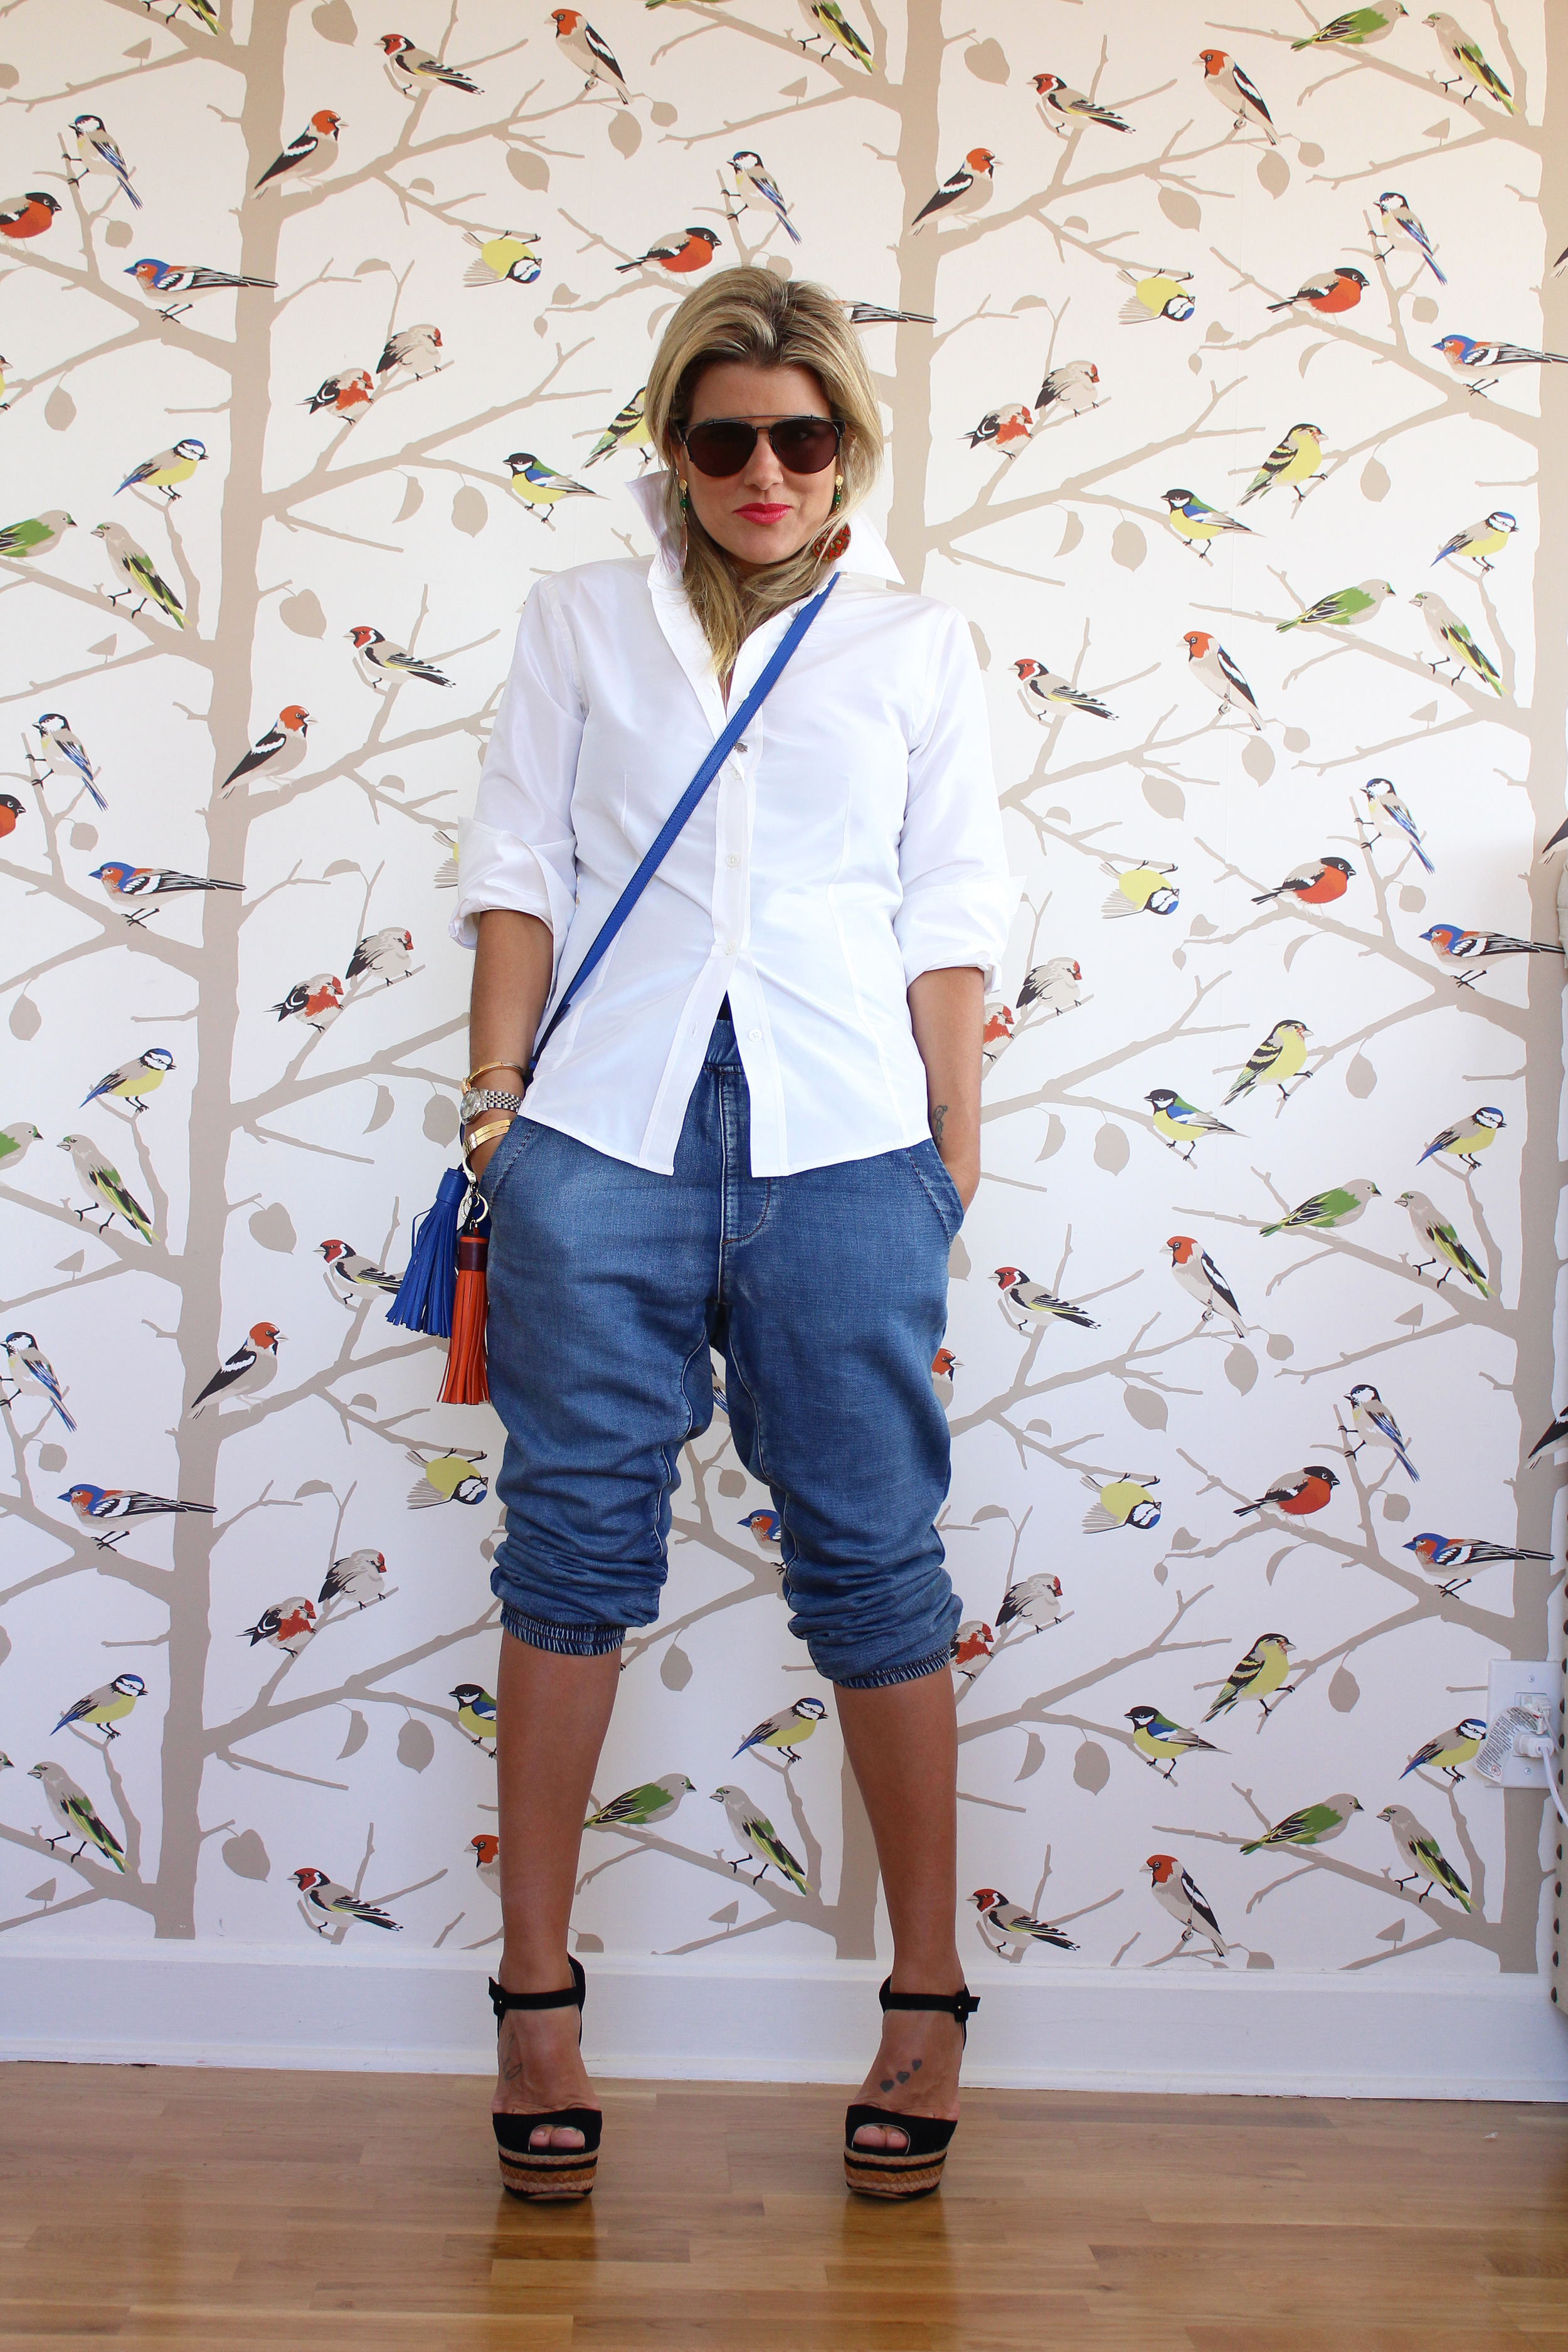 Blogzilla NYC - Jeans and white shirt